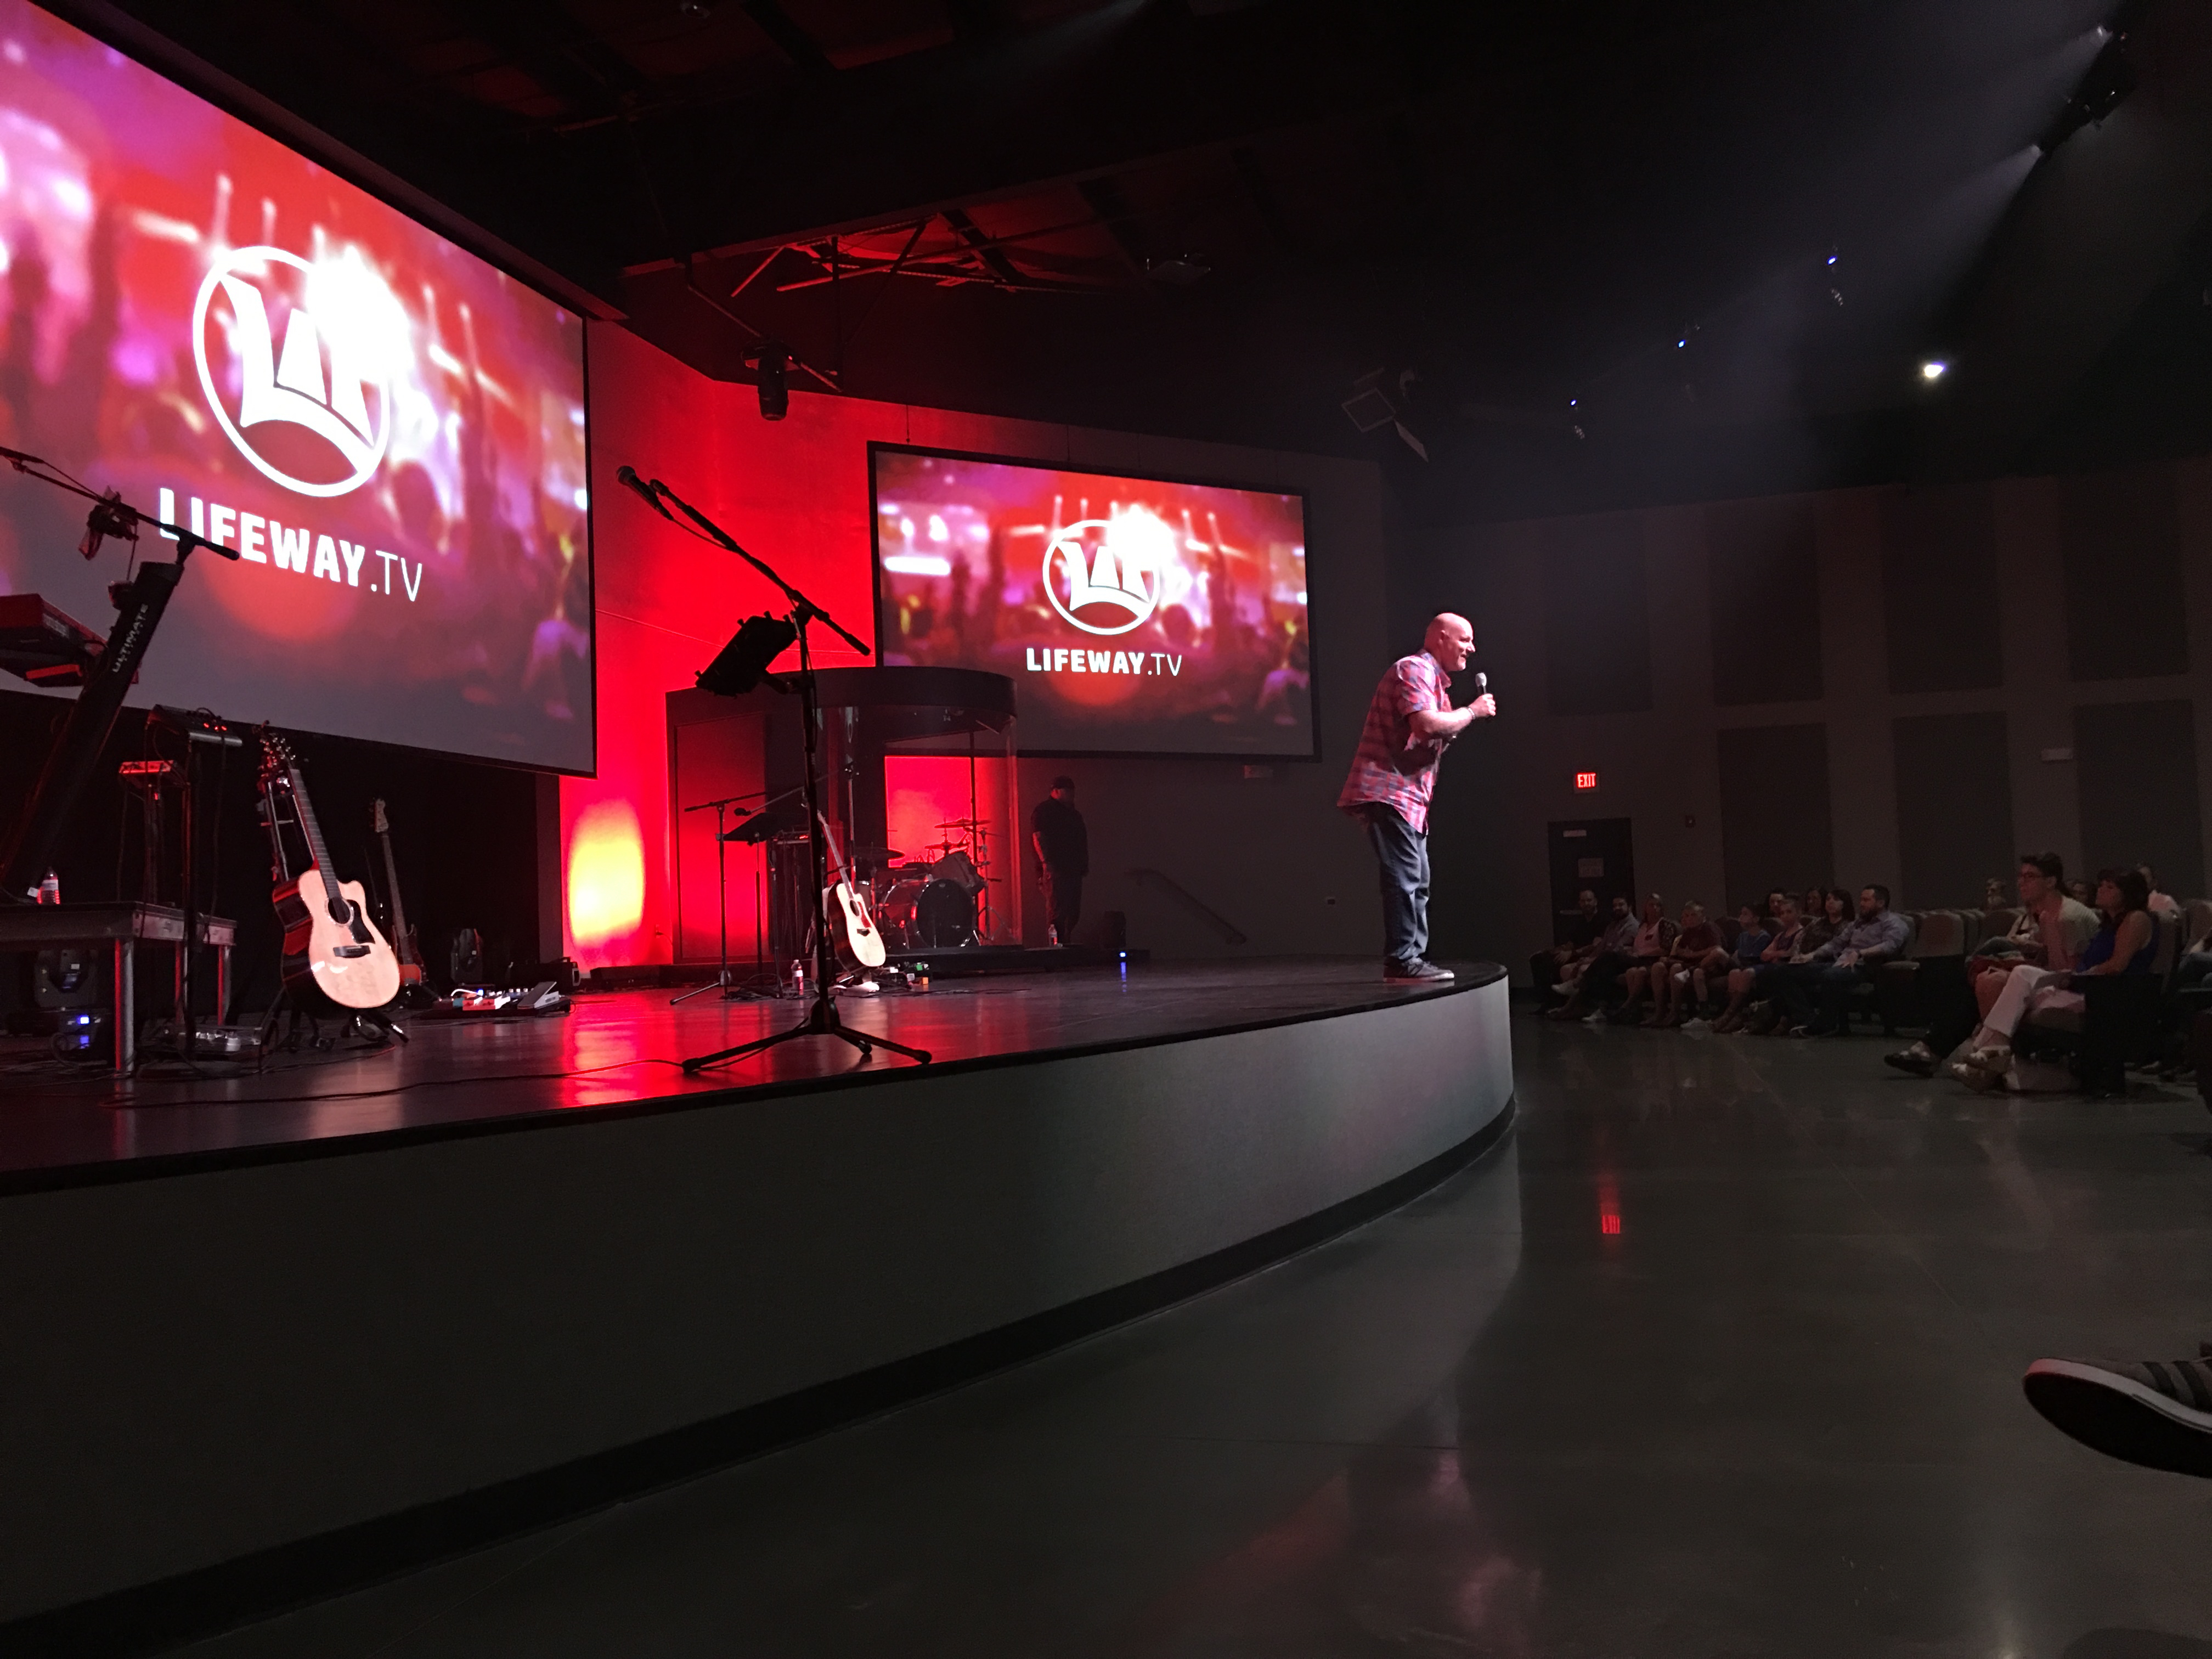 Brent Anderson teaching LifeWay